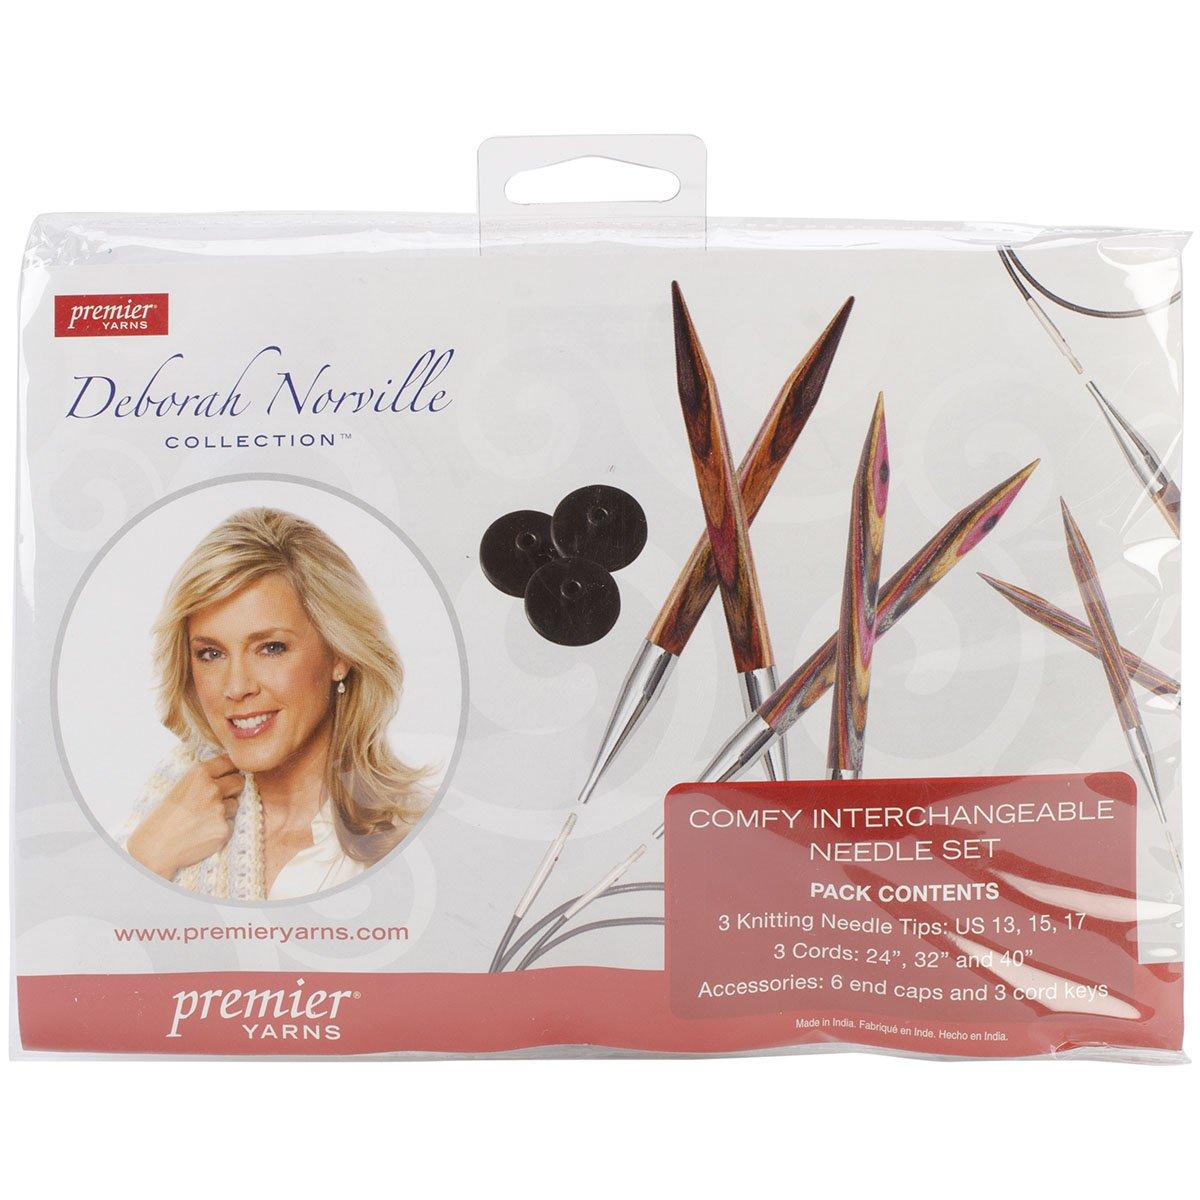 Premier Yarns Deborah Norville Interchangeable Knitting Set, Sizes 13, 15 & 17